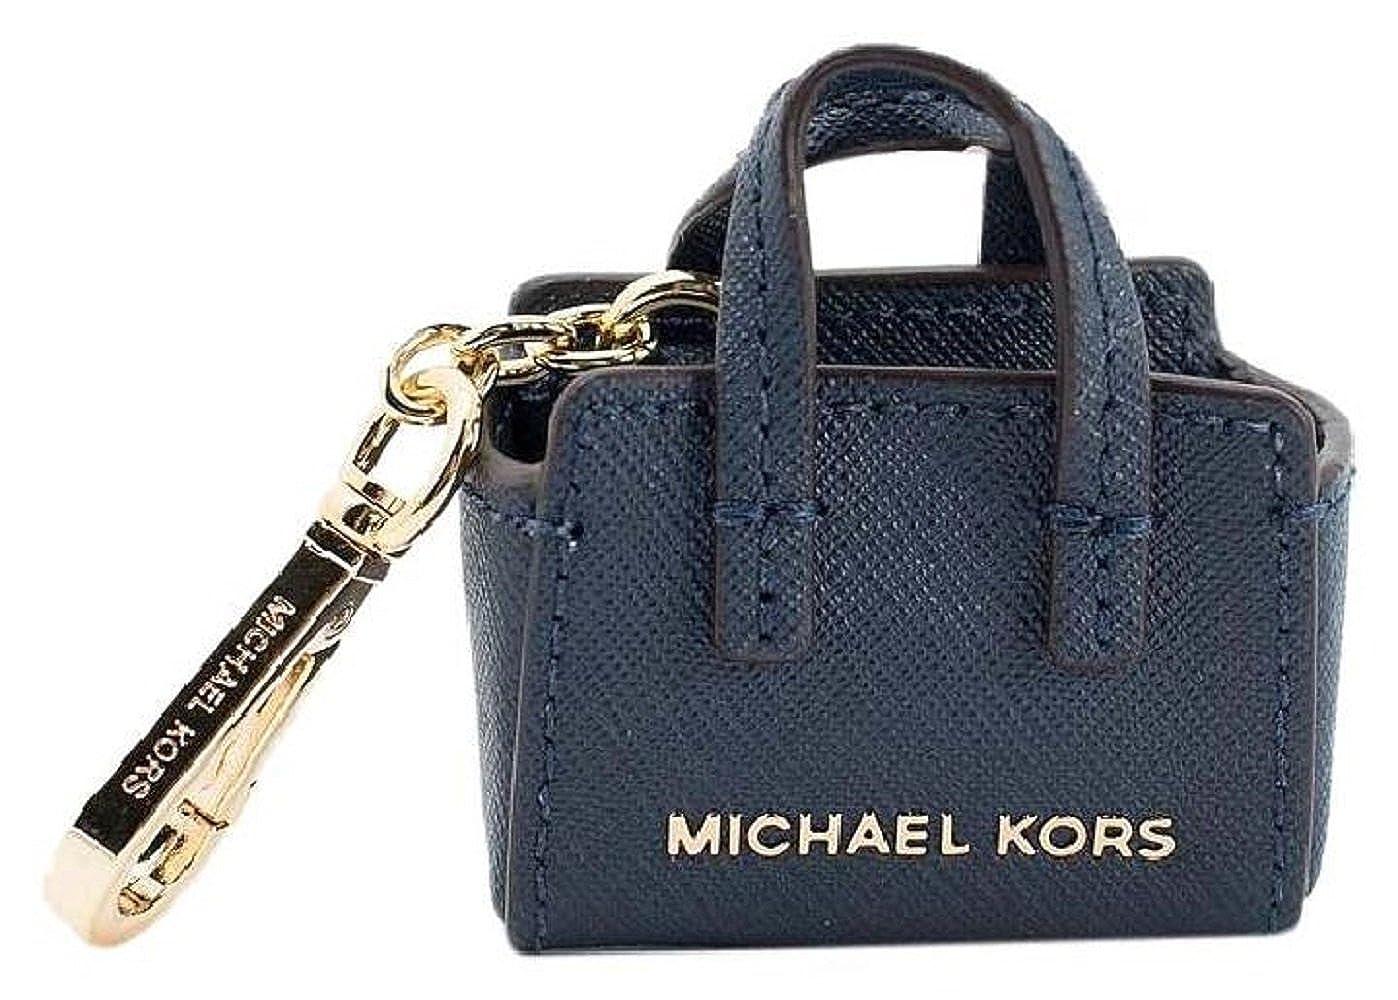 efe9393059d2 ... Purse BeigeNude Key HolderKey Chain Amazon.com Michael Kors Cindy Navy  Saffiano Leather Keychain Bag Charm Shoes ...